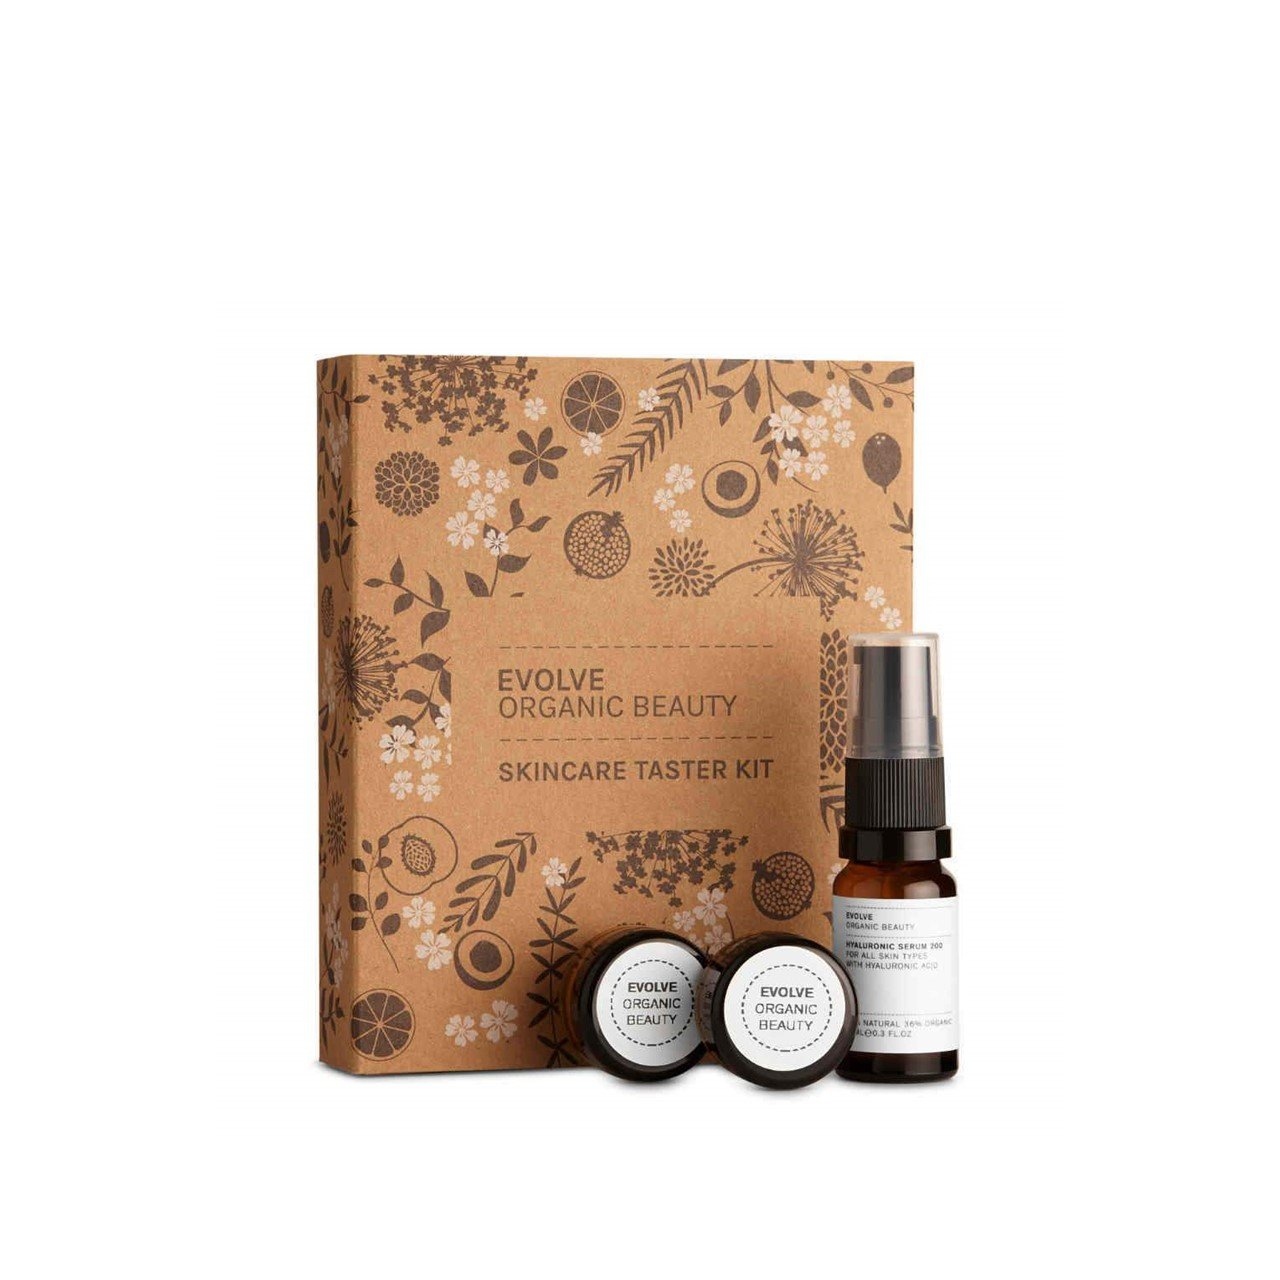 Evolve Organic Skincare Taster Kit